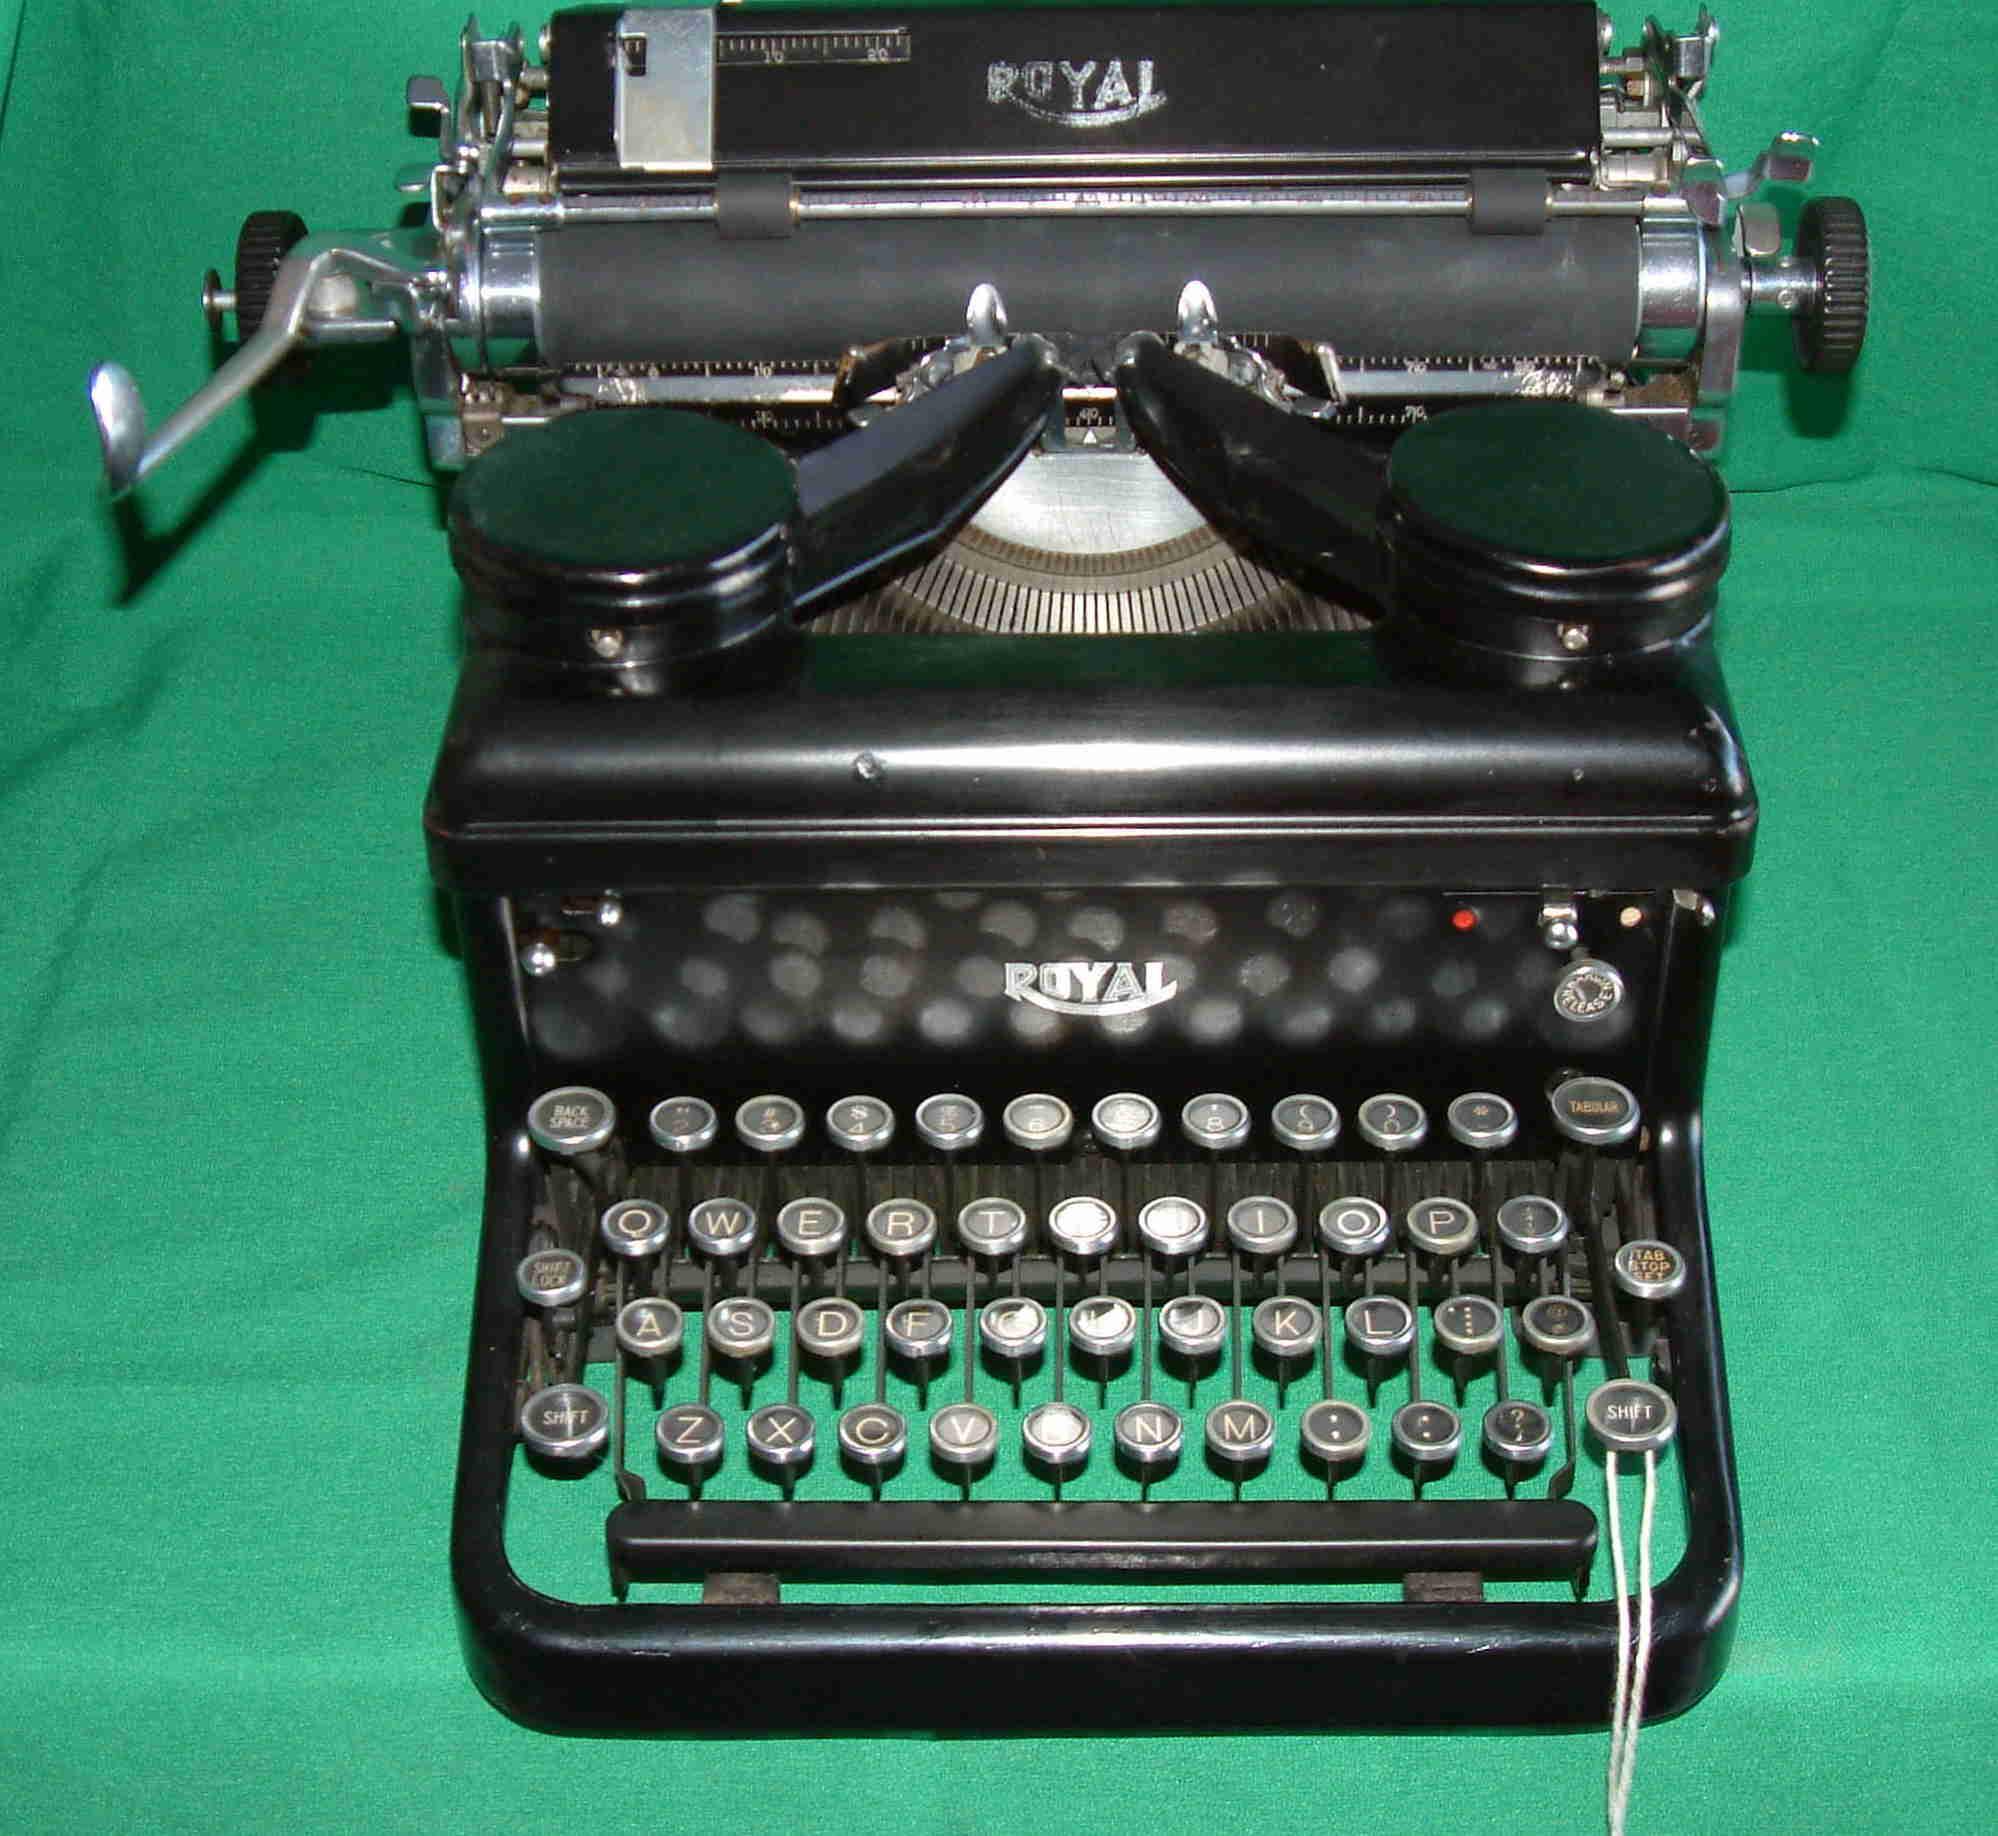 restored royal model s circa 1934 rh debarth org godrej manual typewriter price godrej manual typewriter price